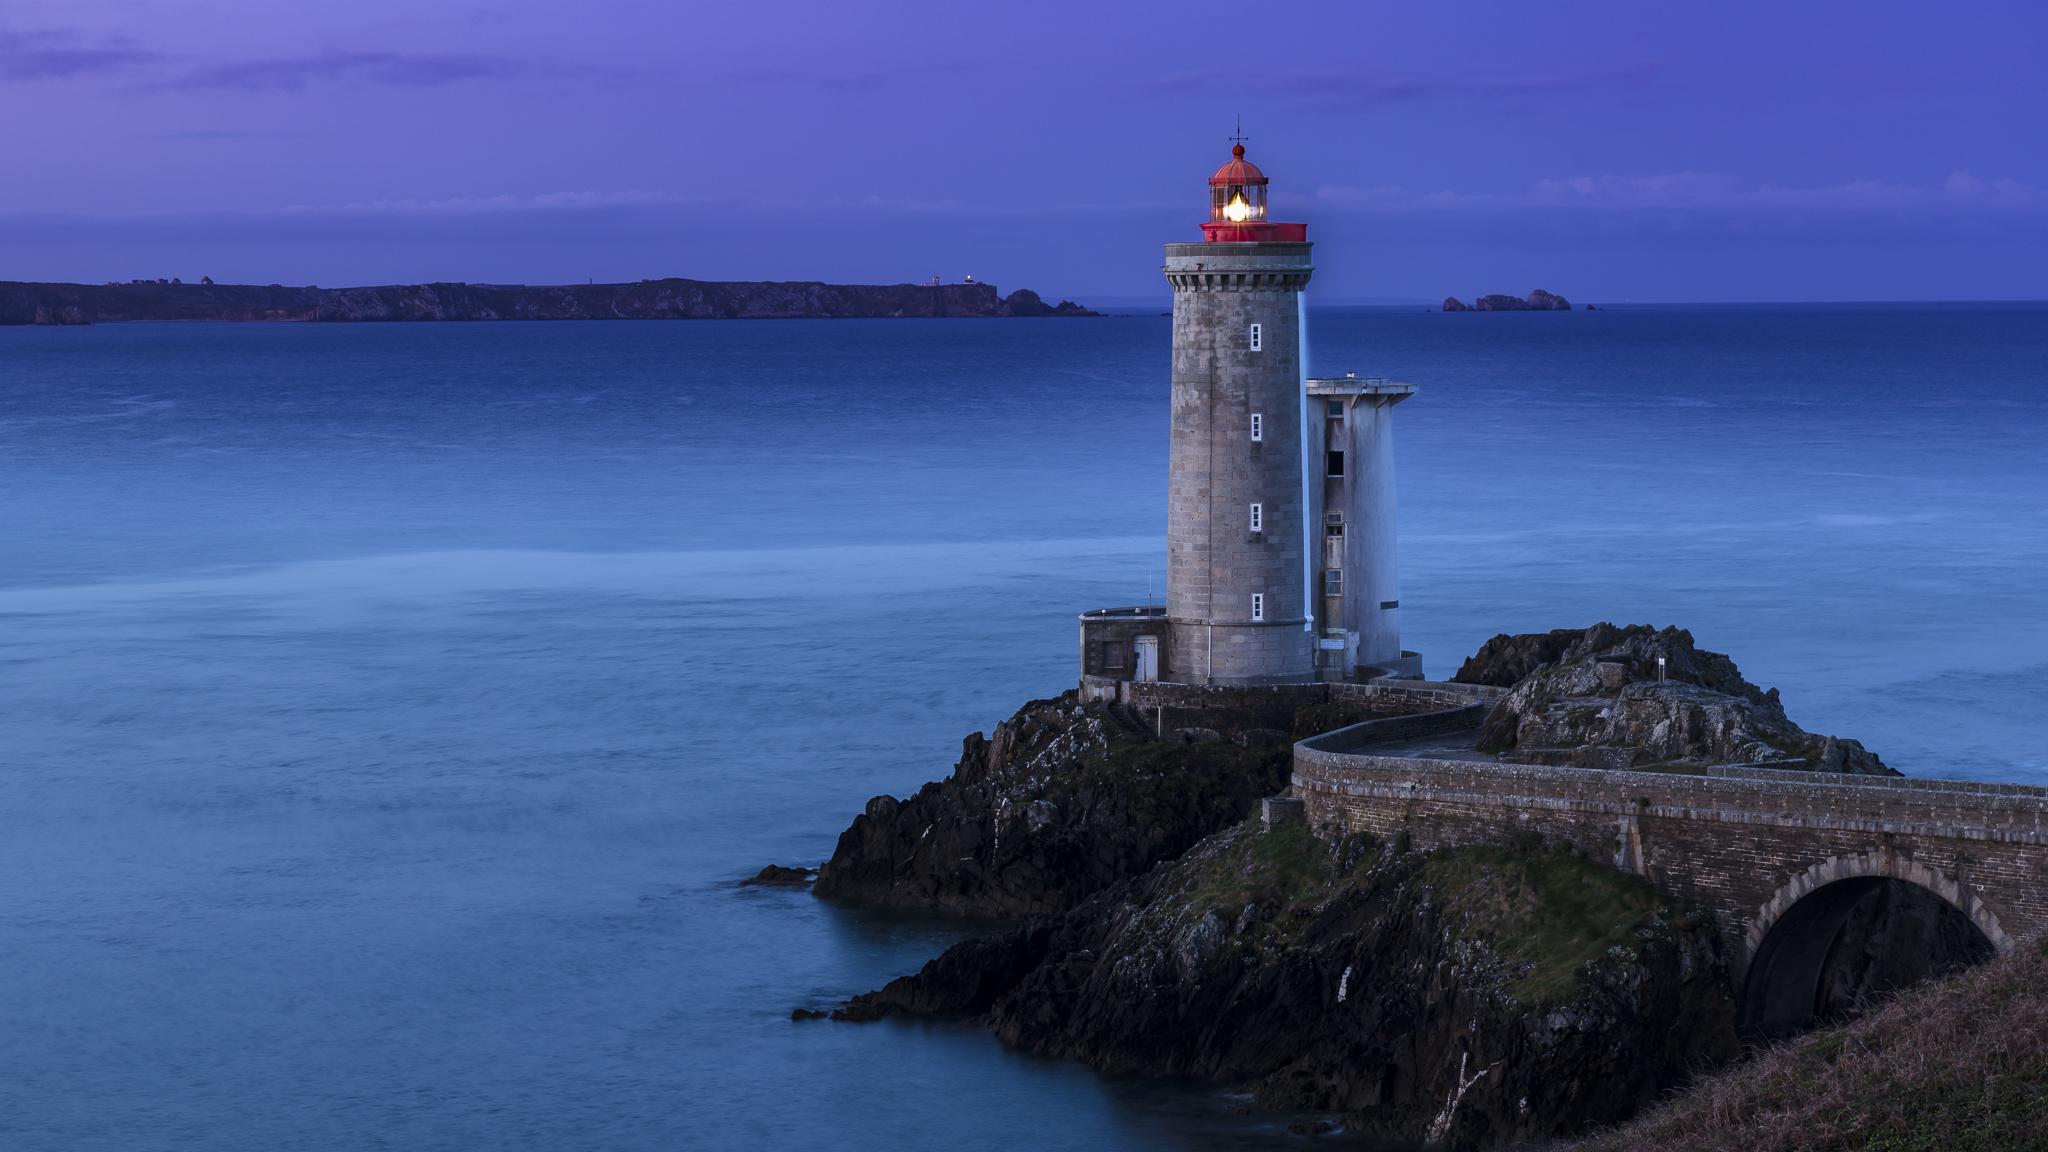 First glimmer of twilight at Phare du Petit Minou, France